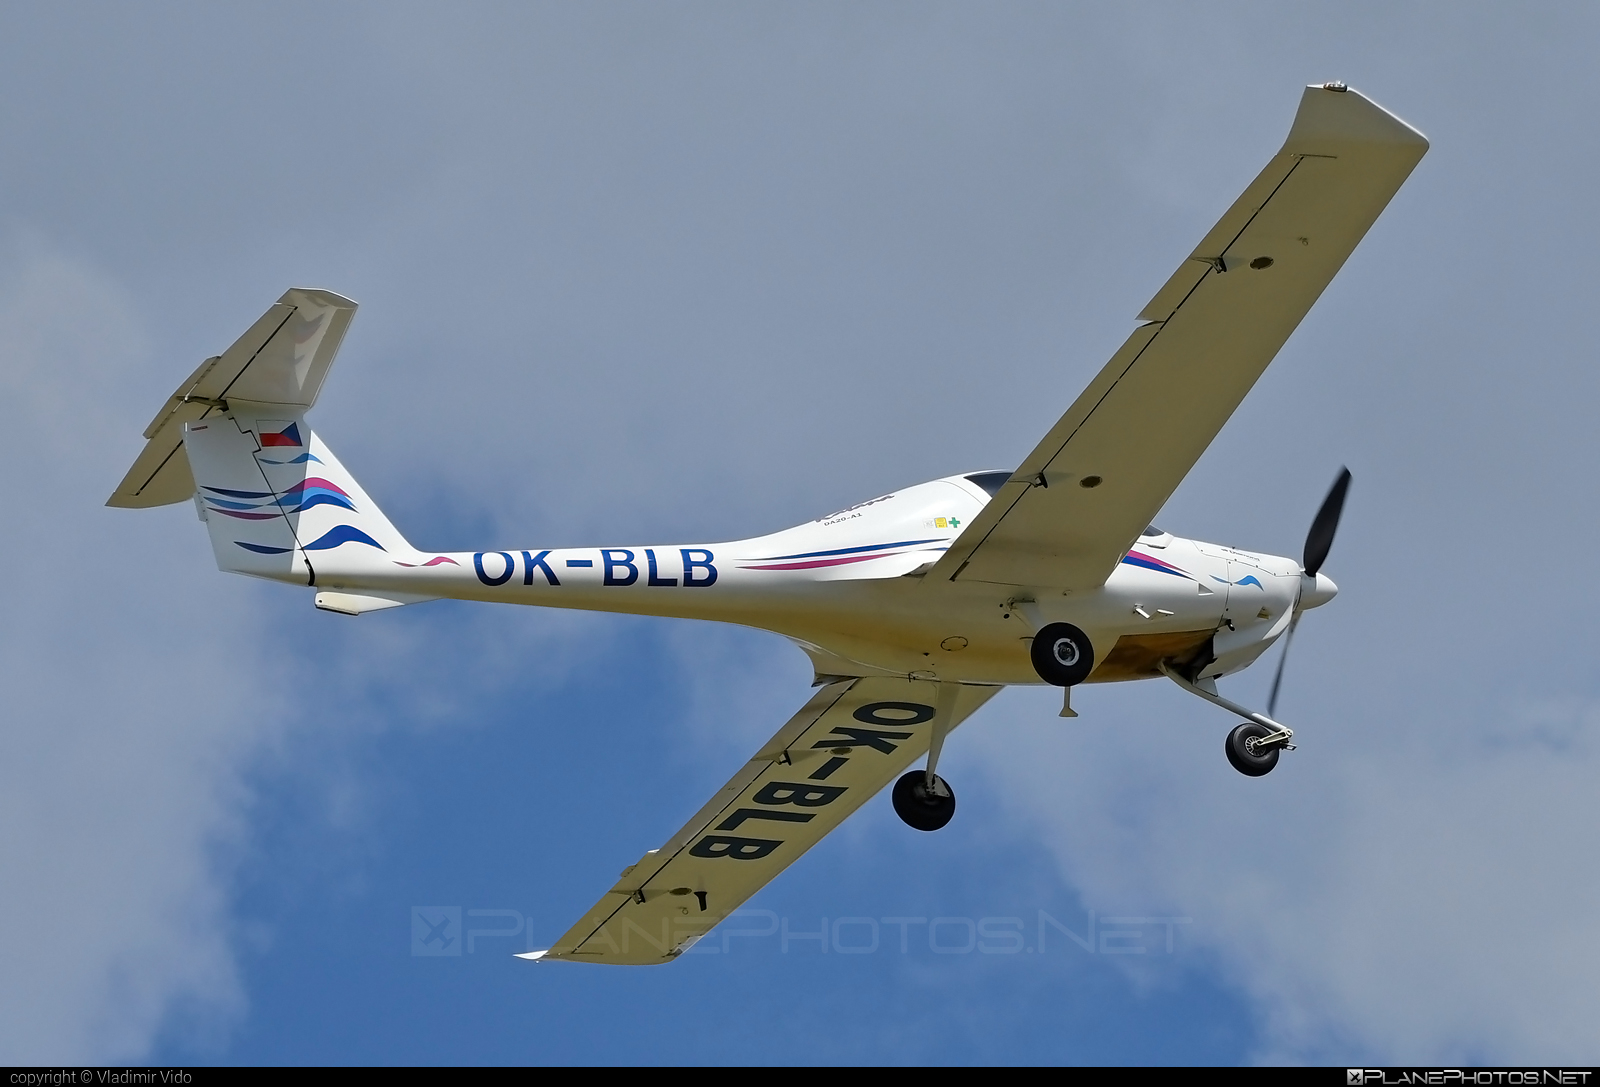 Diamond DA20-A1 Katana - OK-BLB operated by Alfa air s.r.o. #alfaair #da20 #da20a1 #da20a1katana #da20katana #diamond